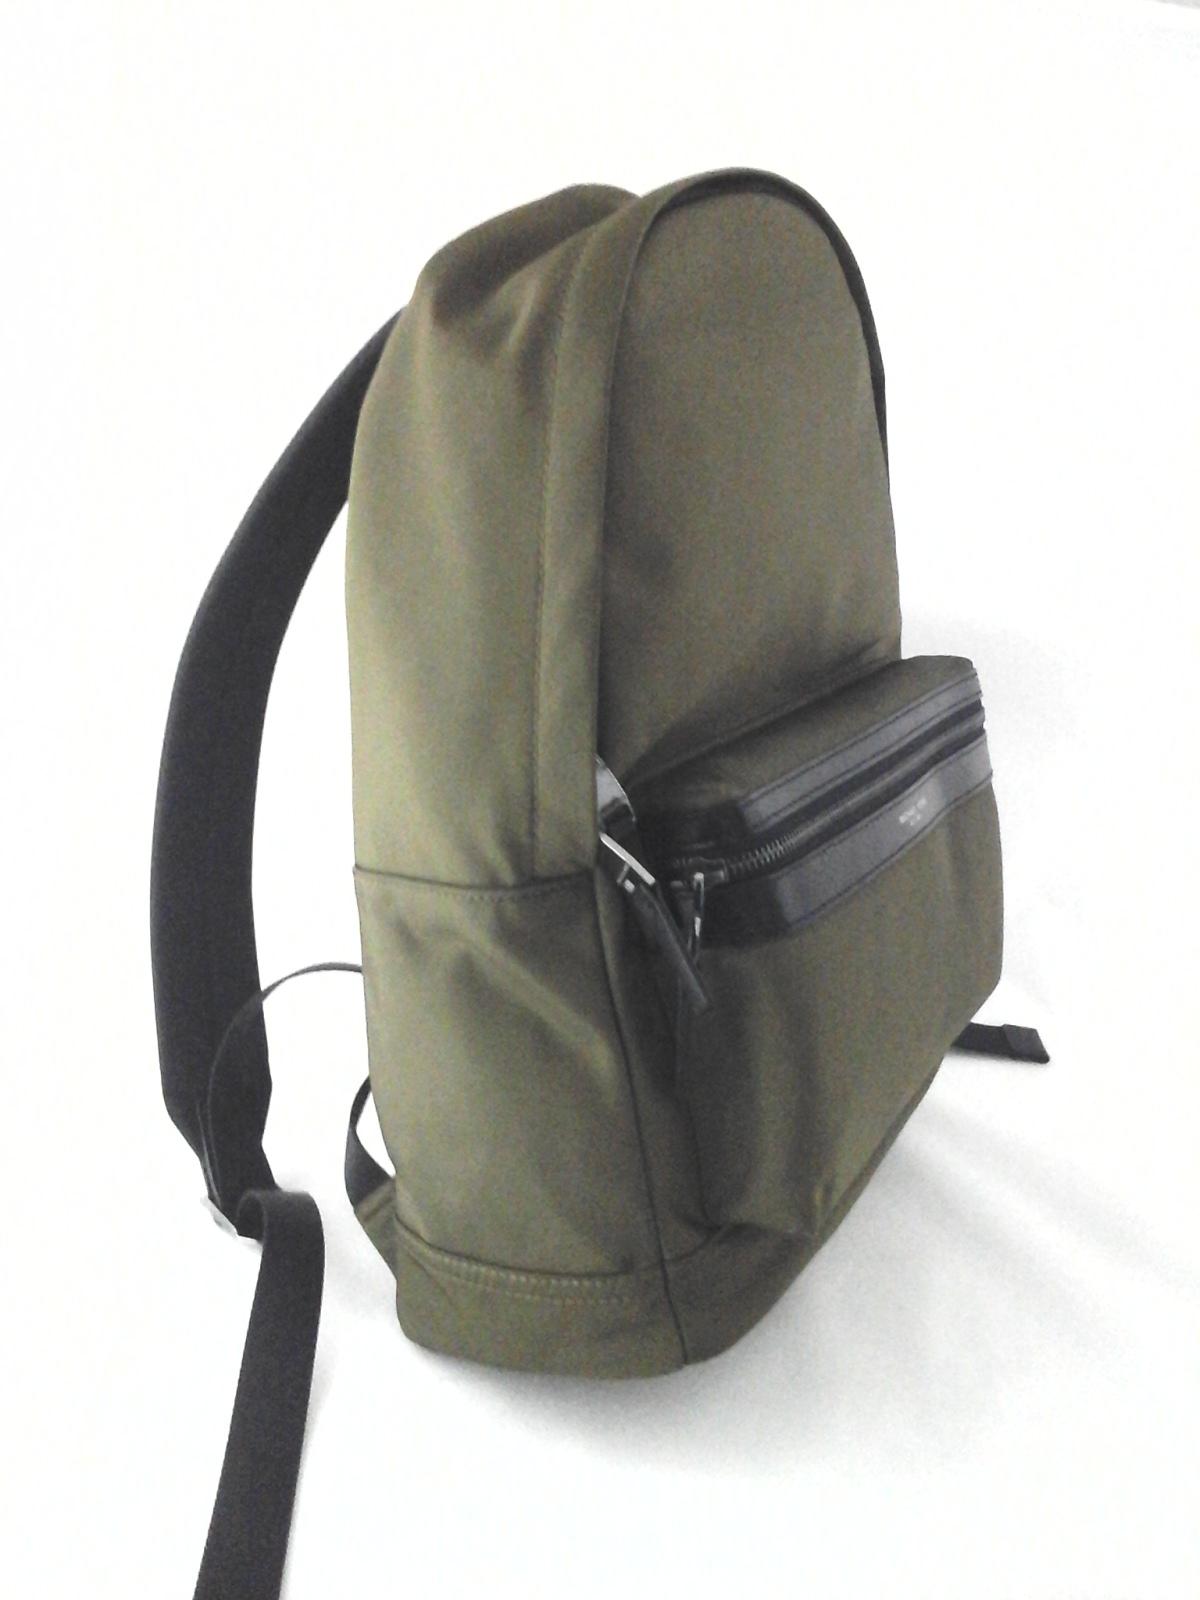 1c70bcd35fc5 MICHAEL KORS Backpack Kent MK Military Olive Green/Black Leather Trim Bag  $198